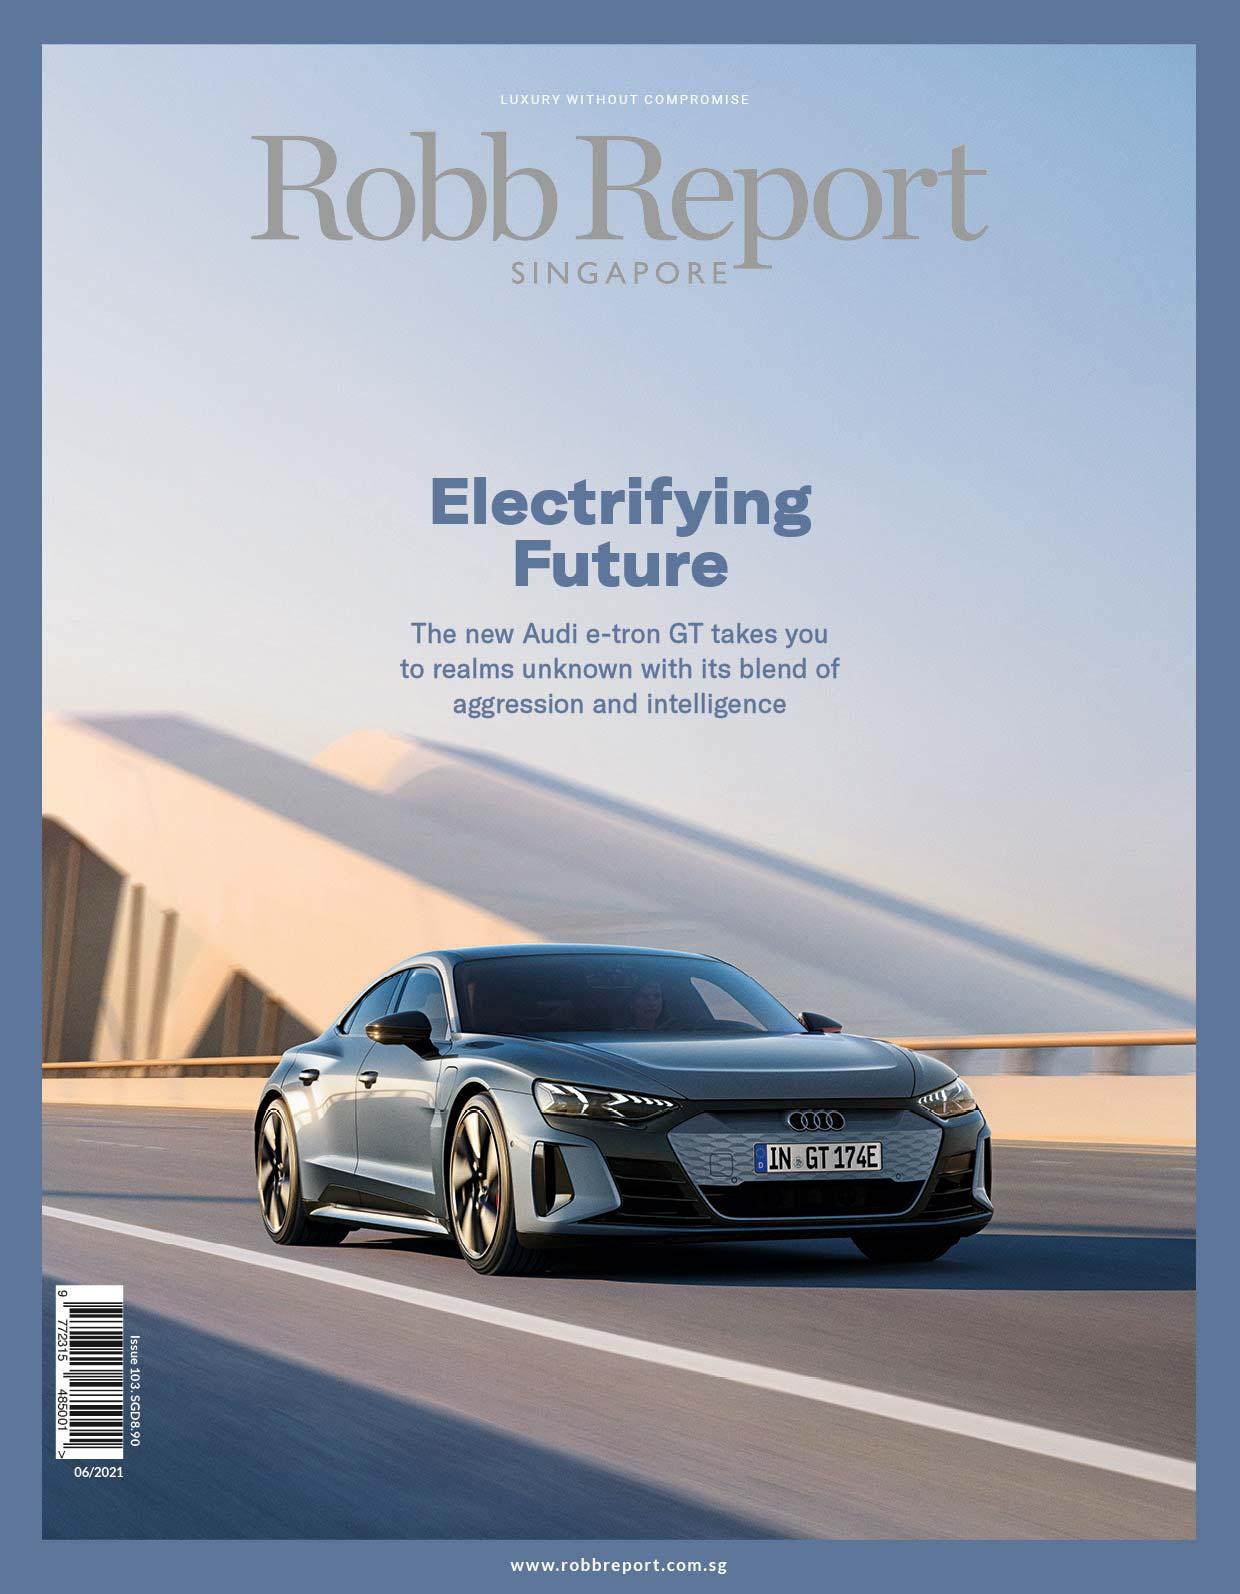 Robb Report Singapore June 2021 issue